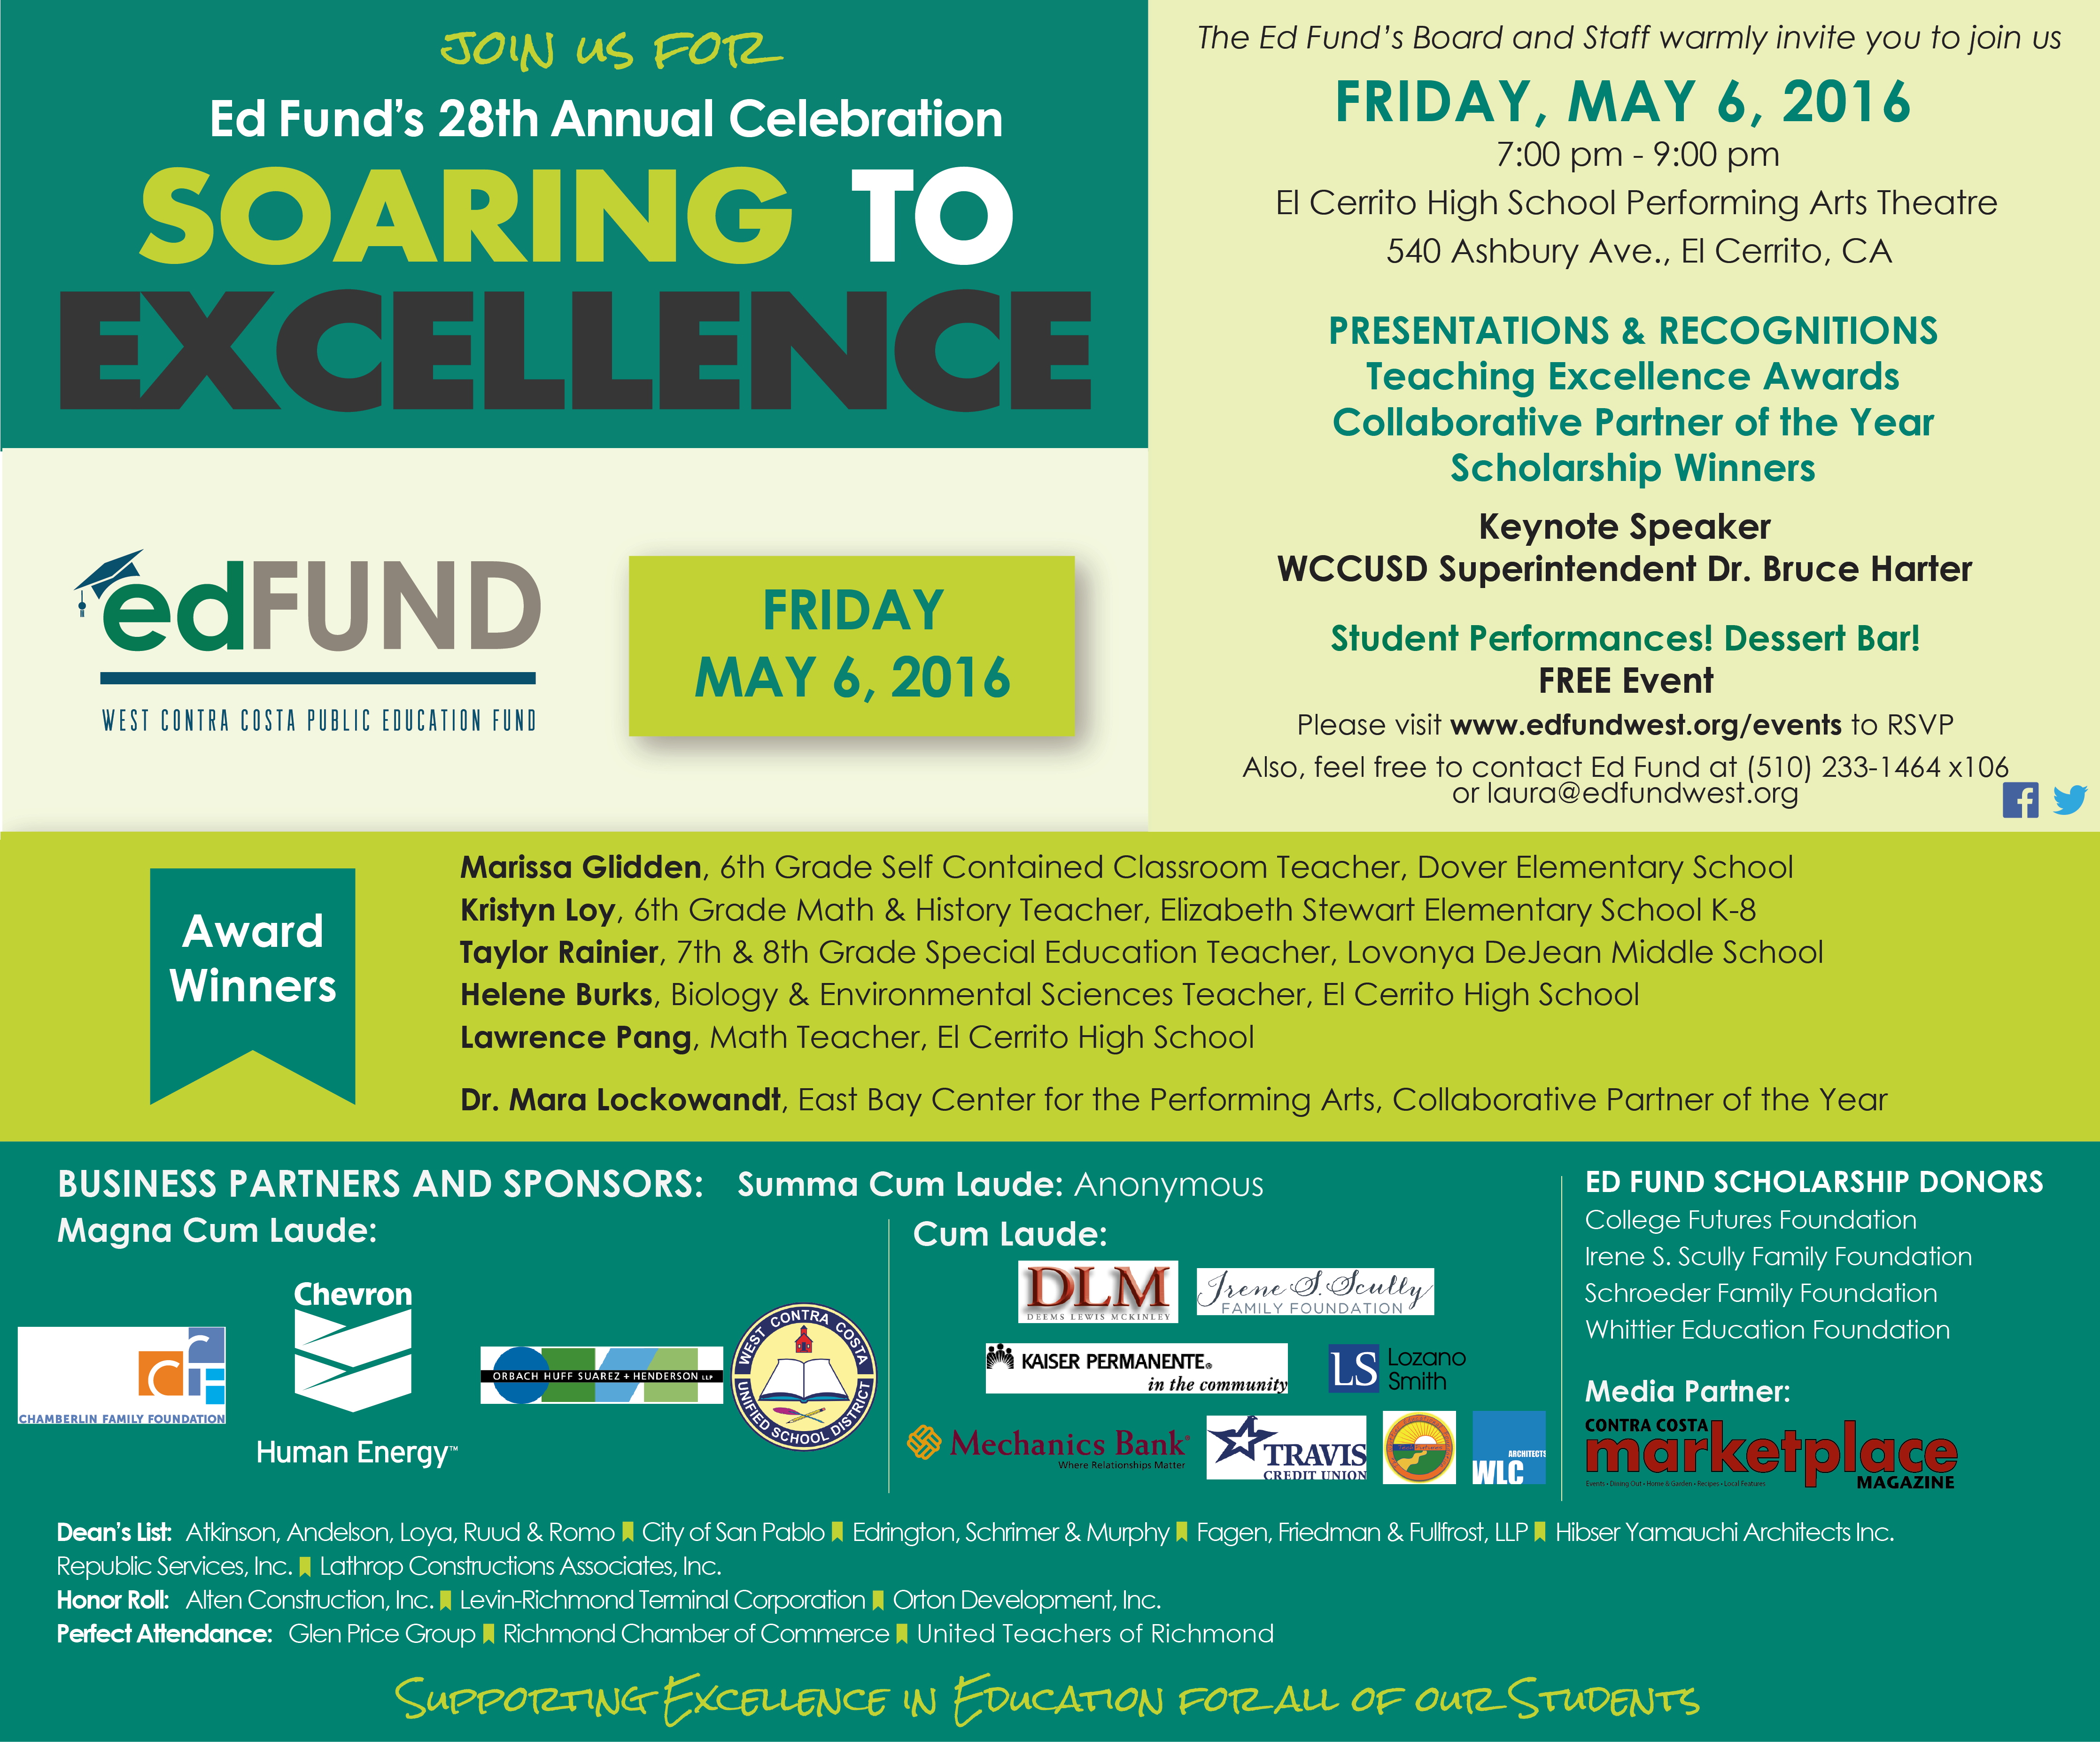 Soaring to Excellence Celebration invite